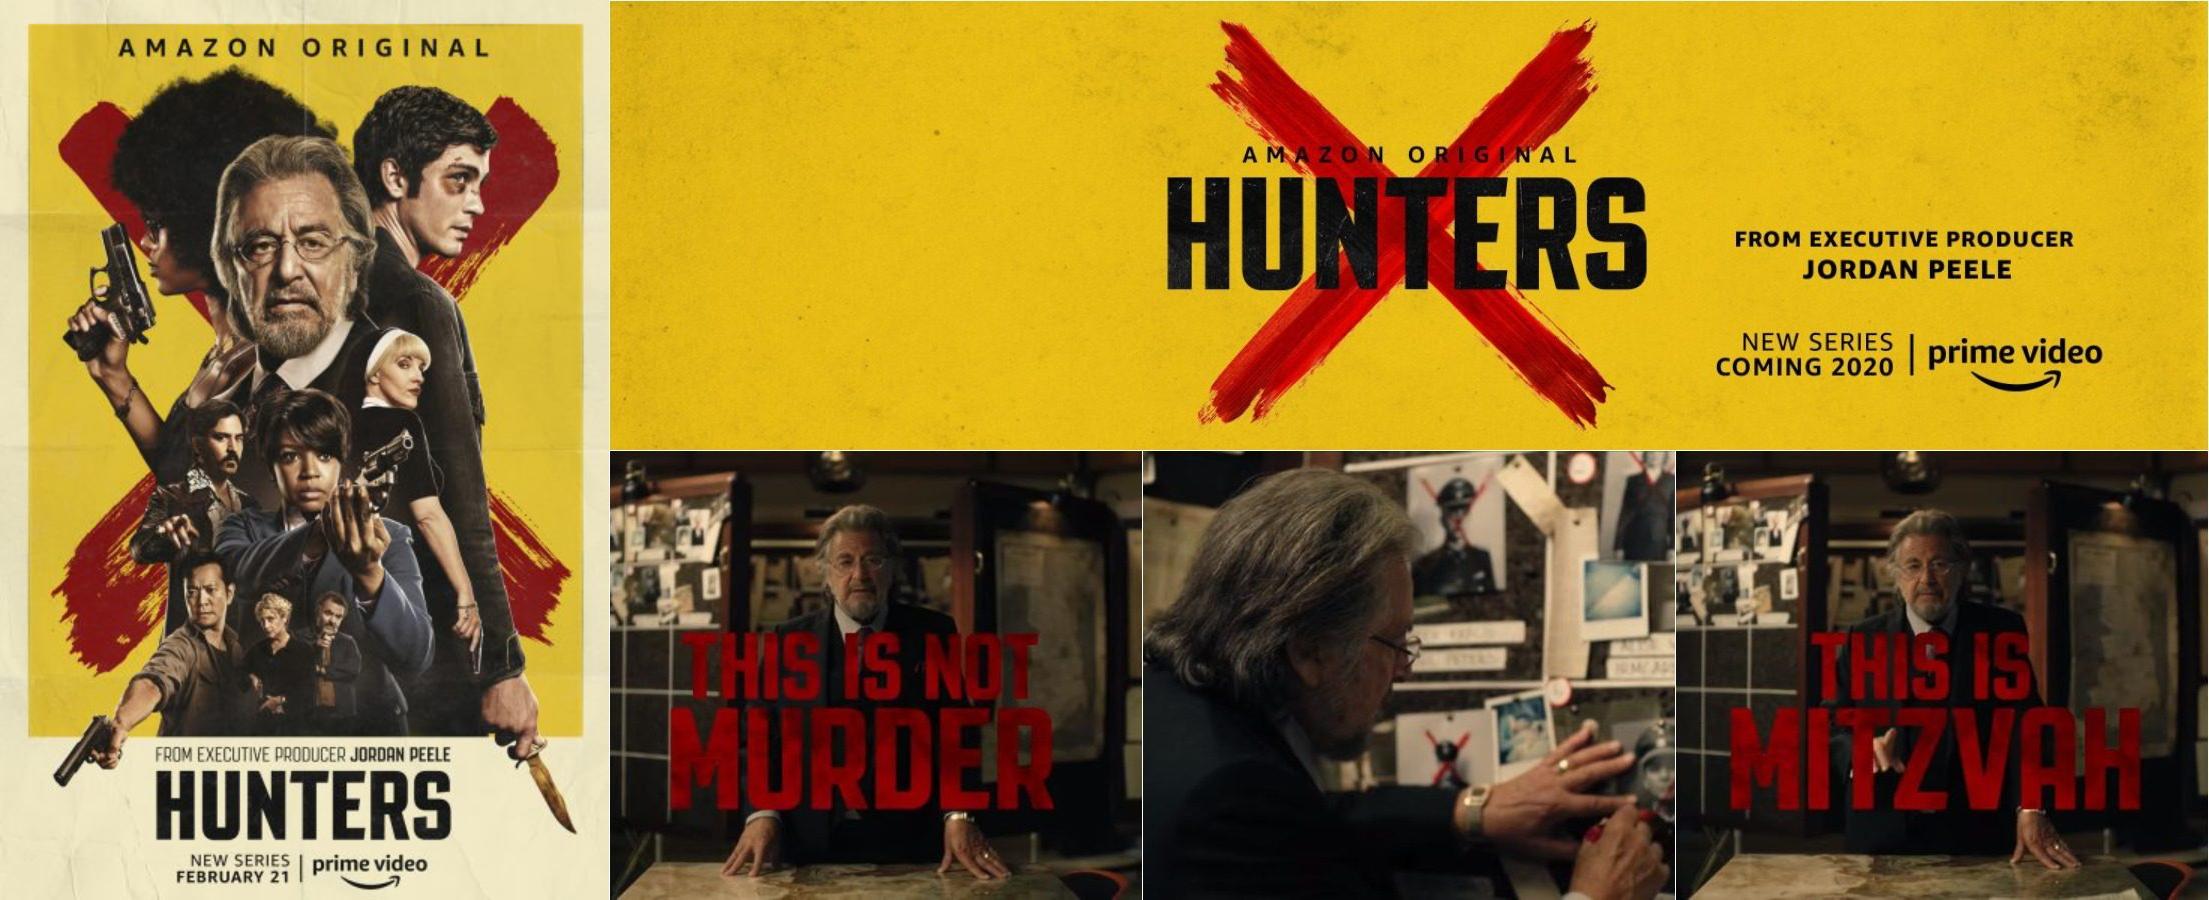 Hunters Al Pacino